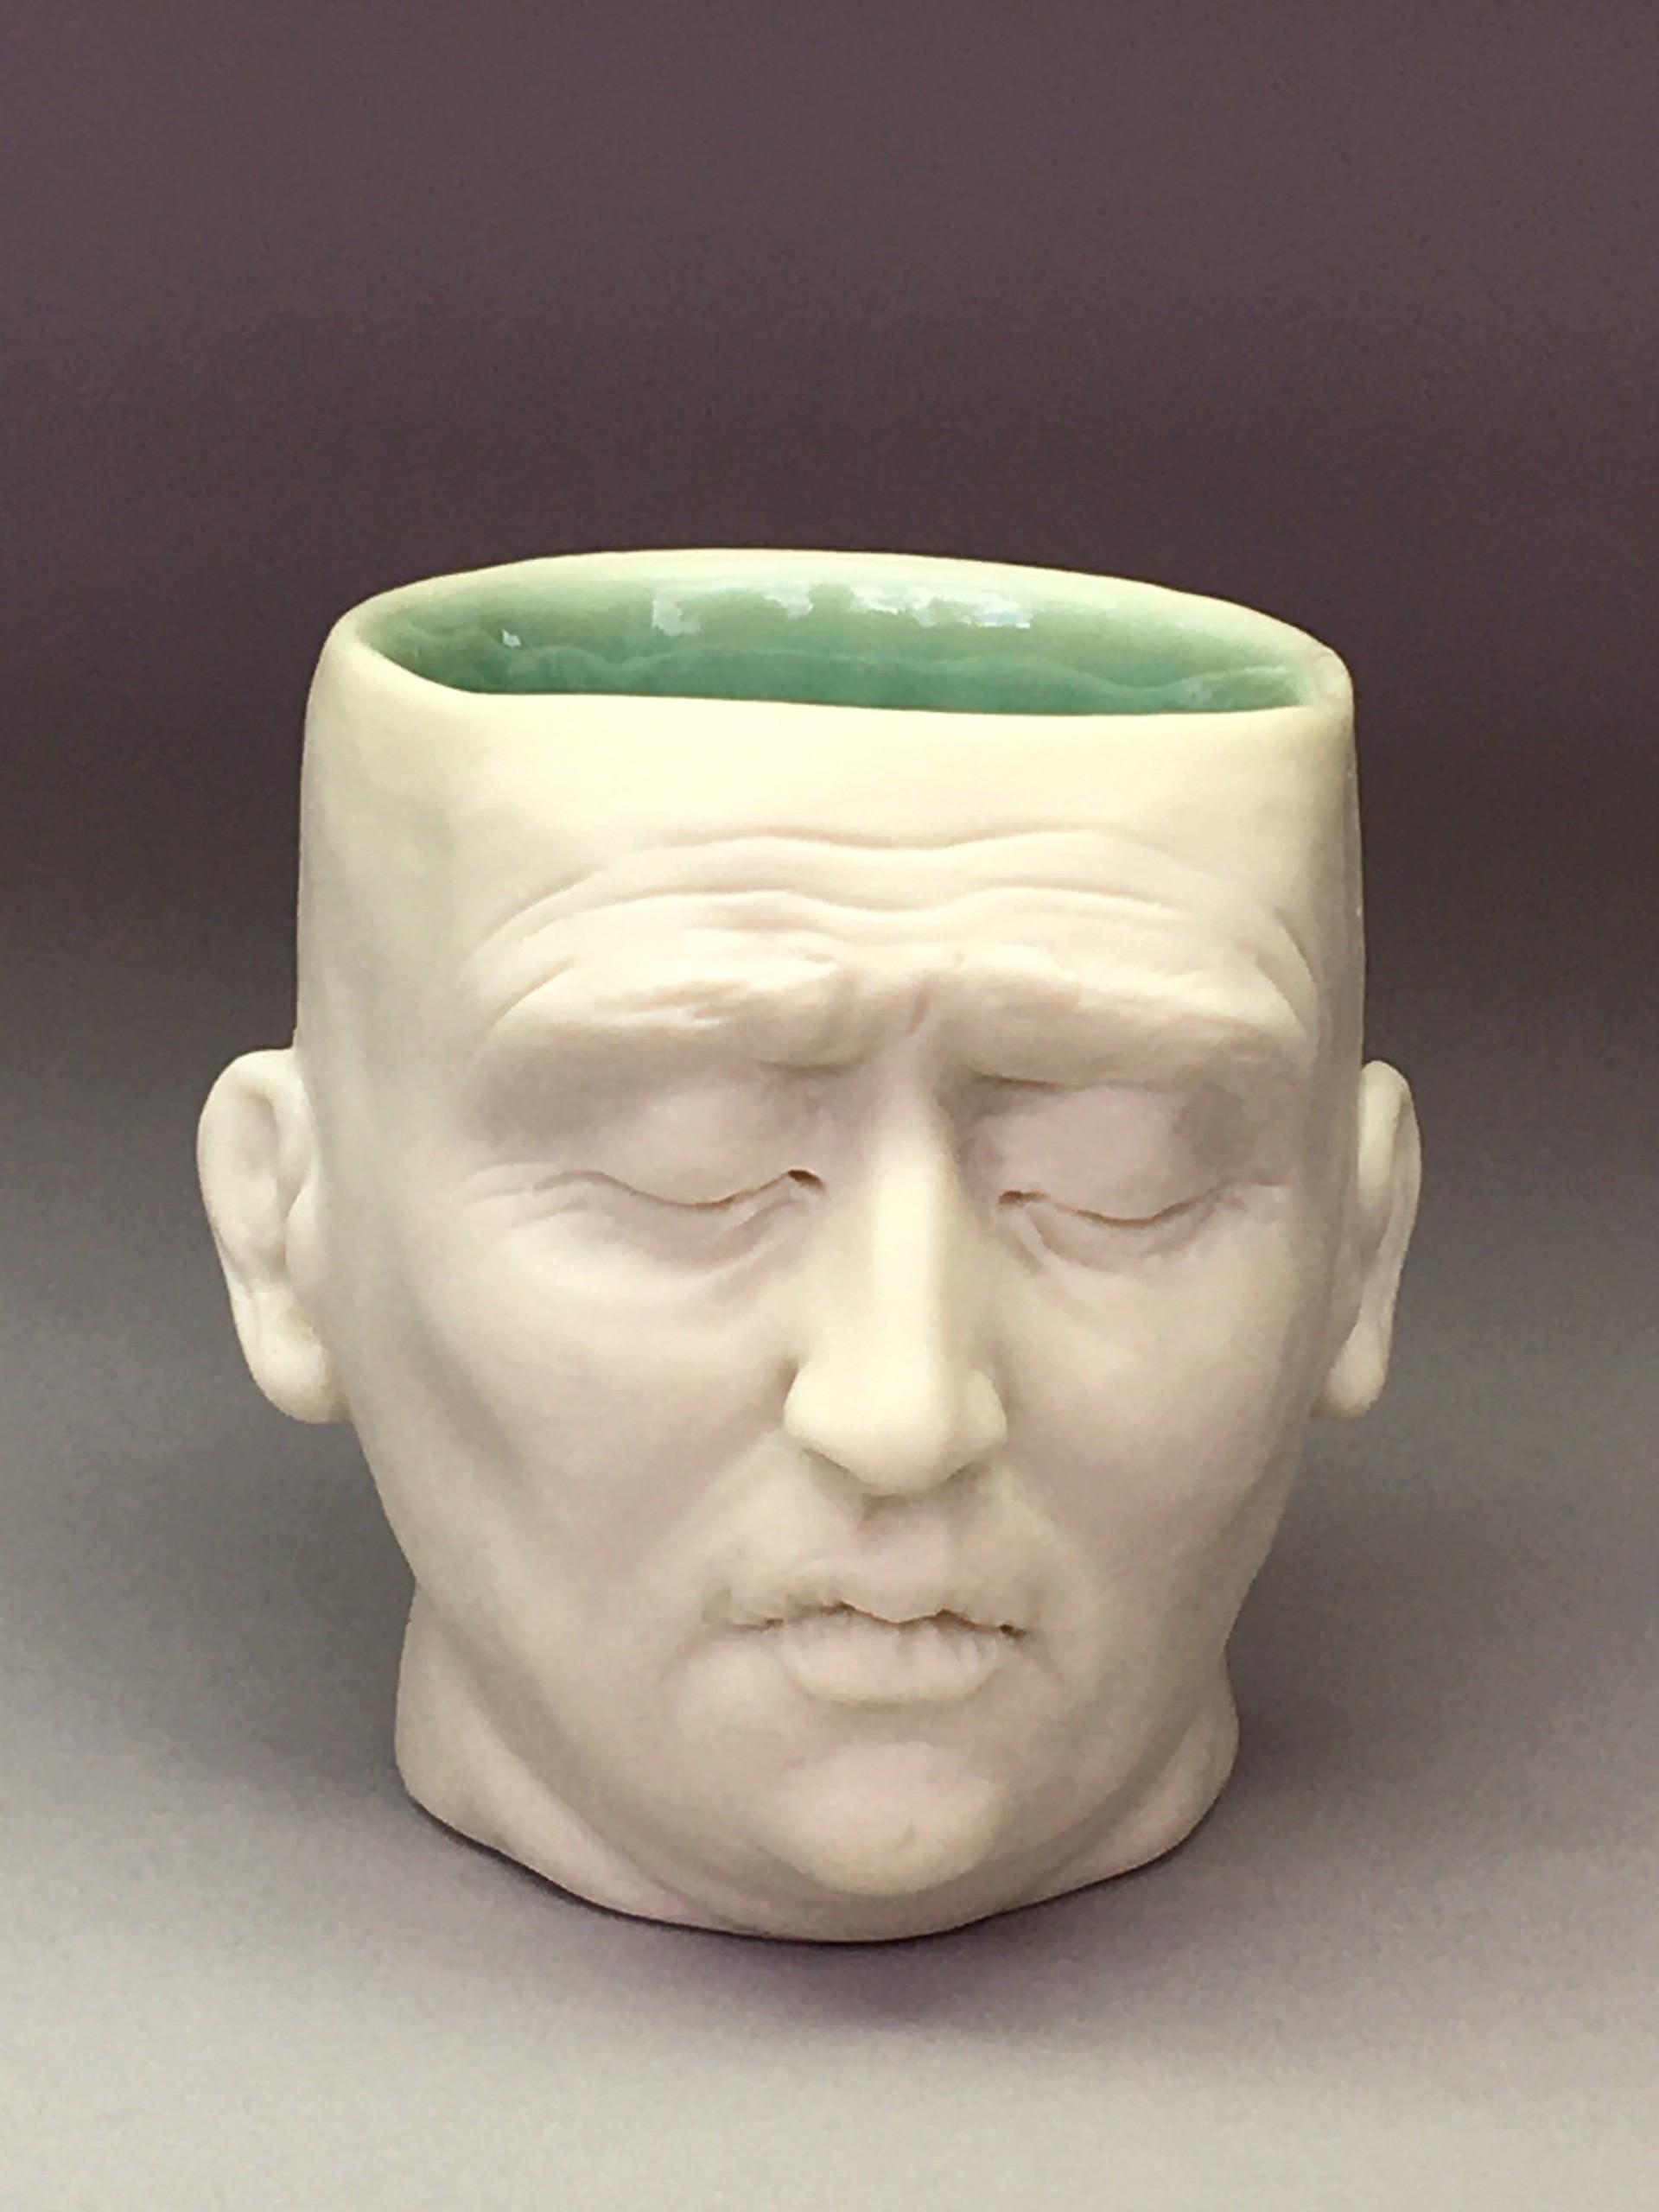 """Worried Friend Shot Glass II"" (dark green interior, closed eyes) by Adrian Arleo"